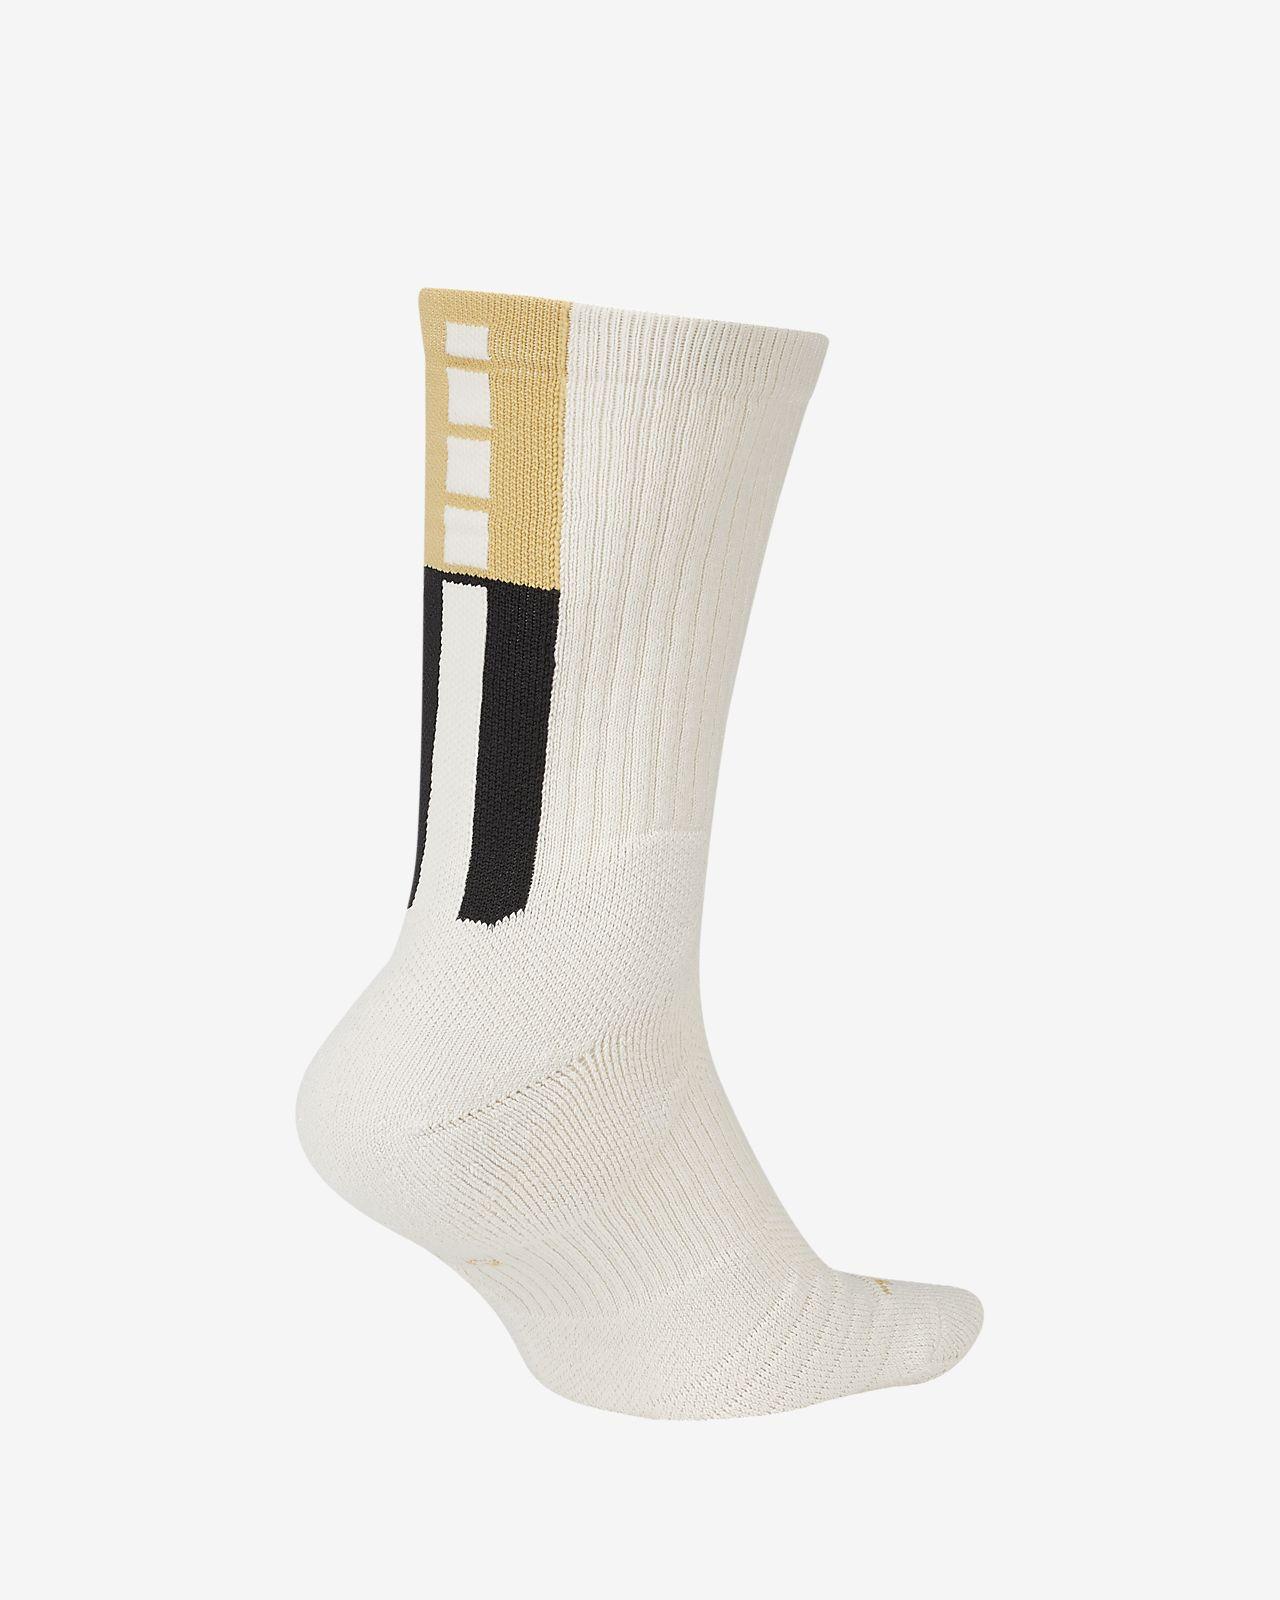 Nike Elite Kyrie Crew Basketball Socks